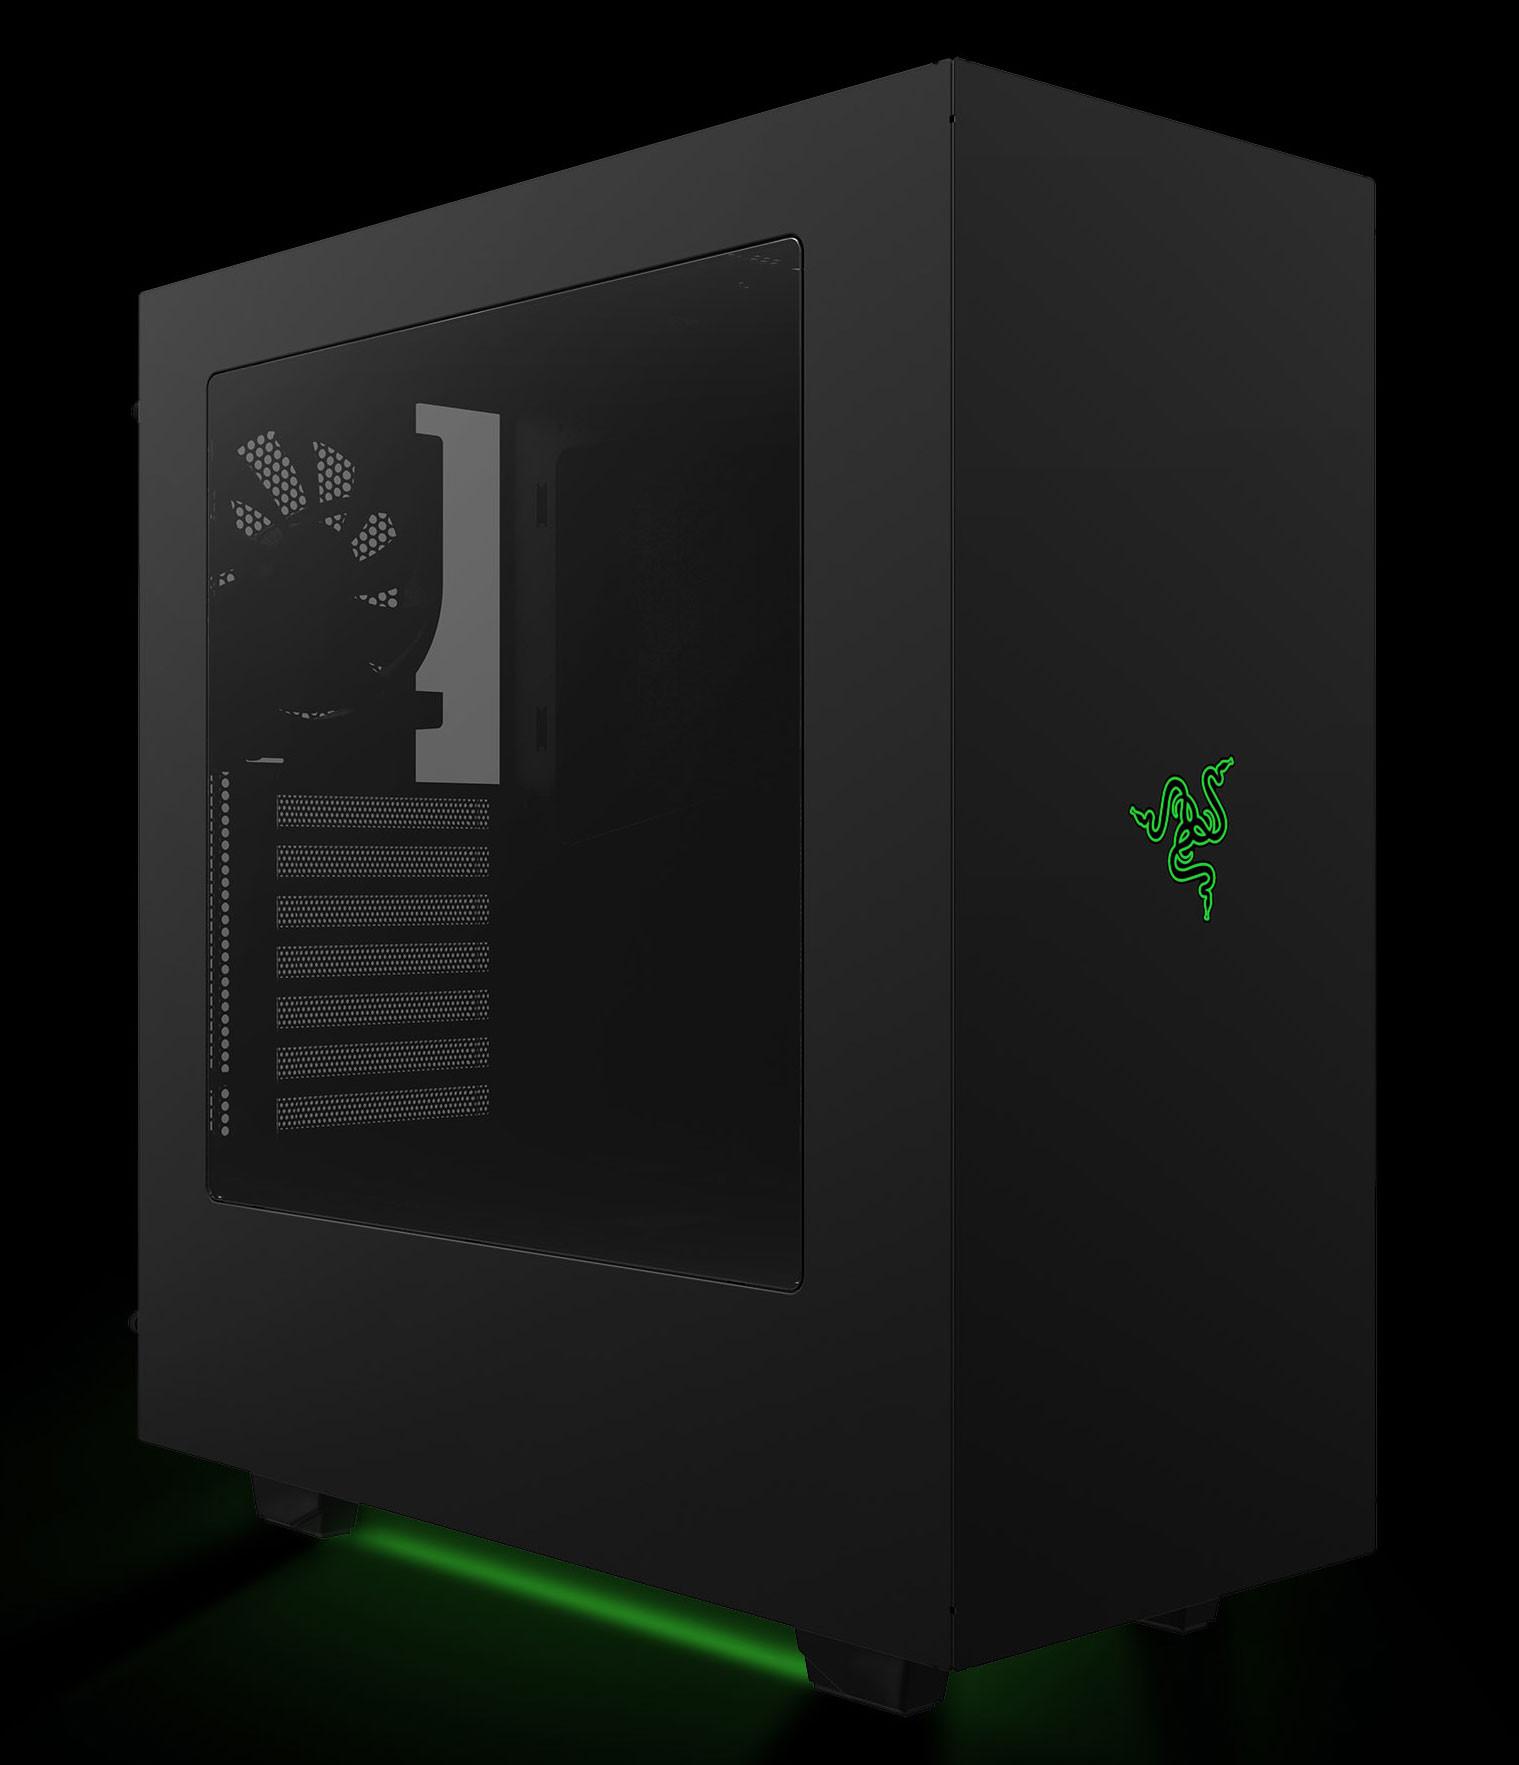 Razer Announces Custom Designed NZXT S340 PC Case : techPowerUp